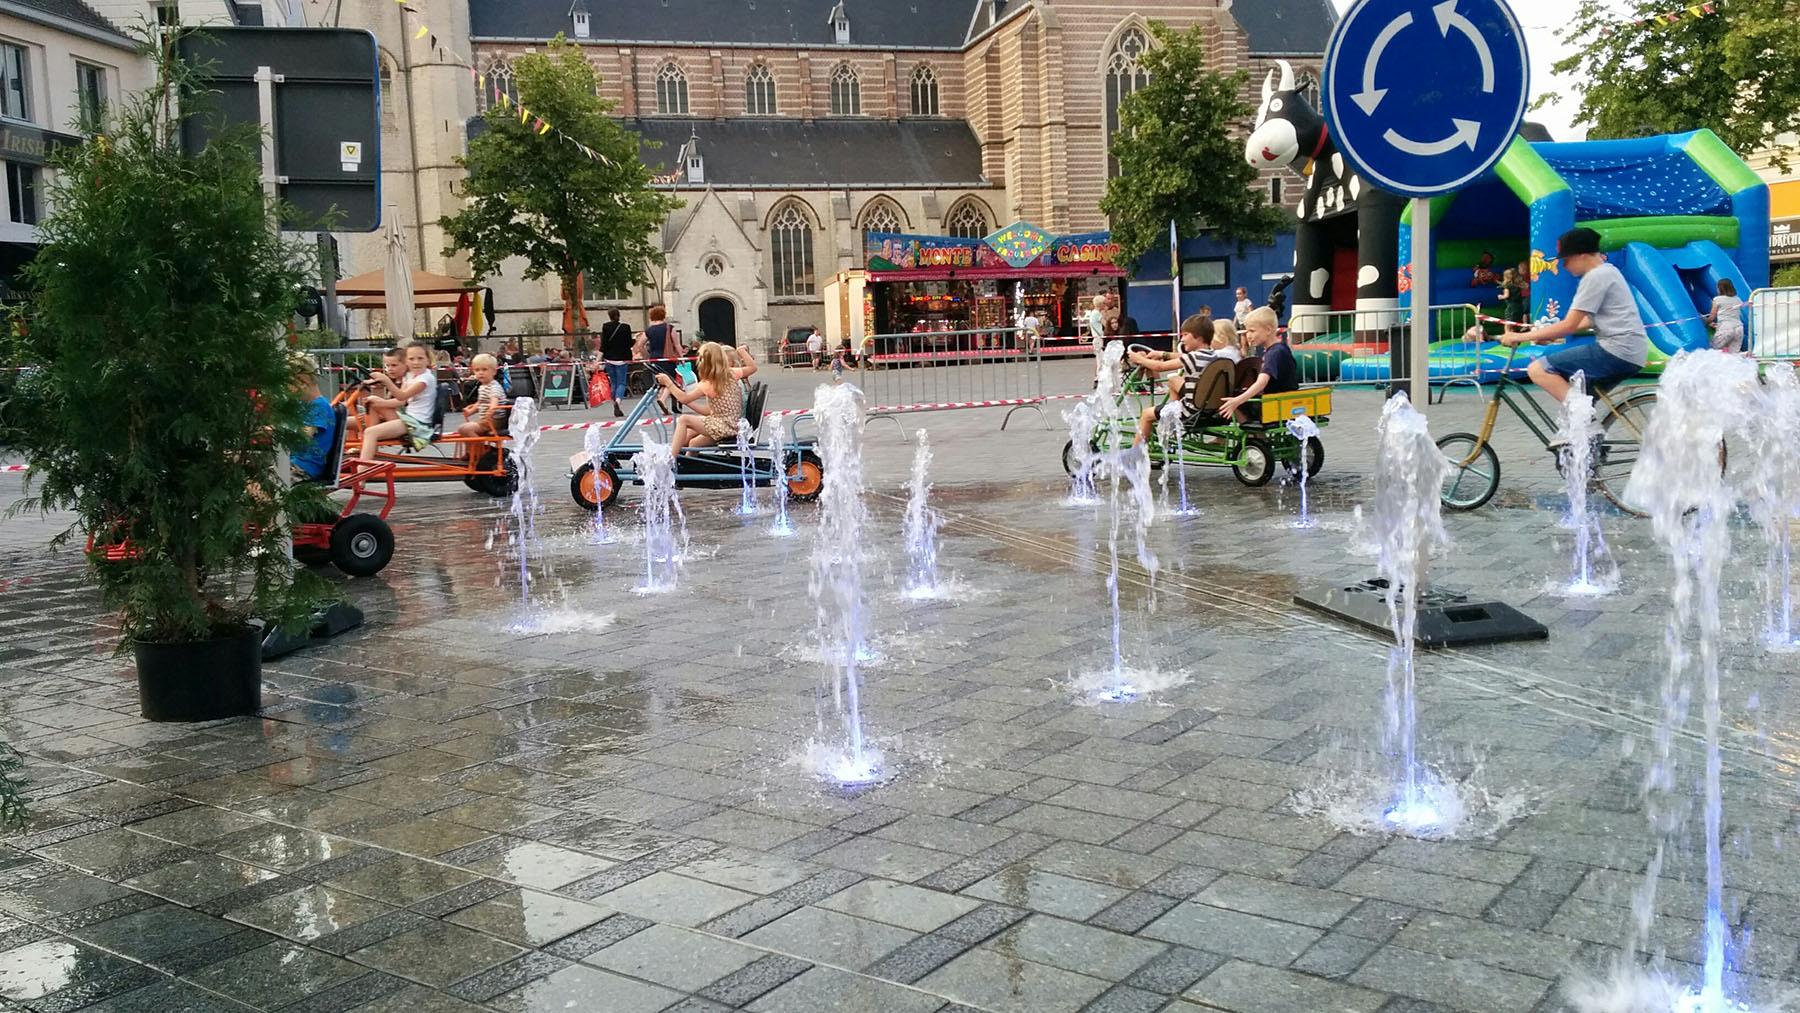 markt-geel-fontein-gekke-fietsen